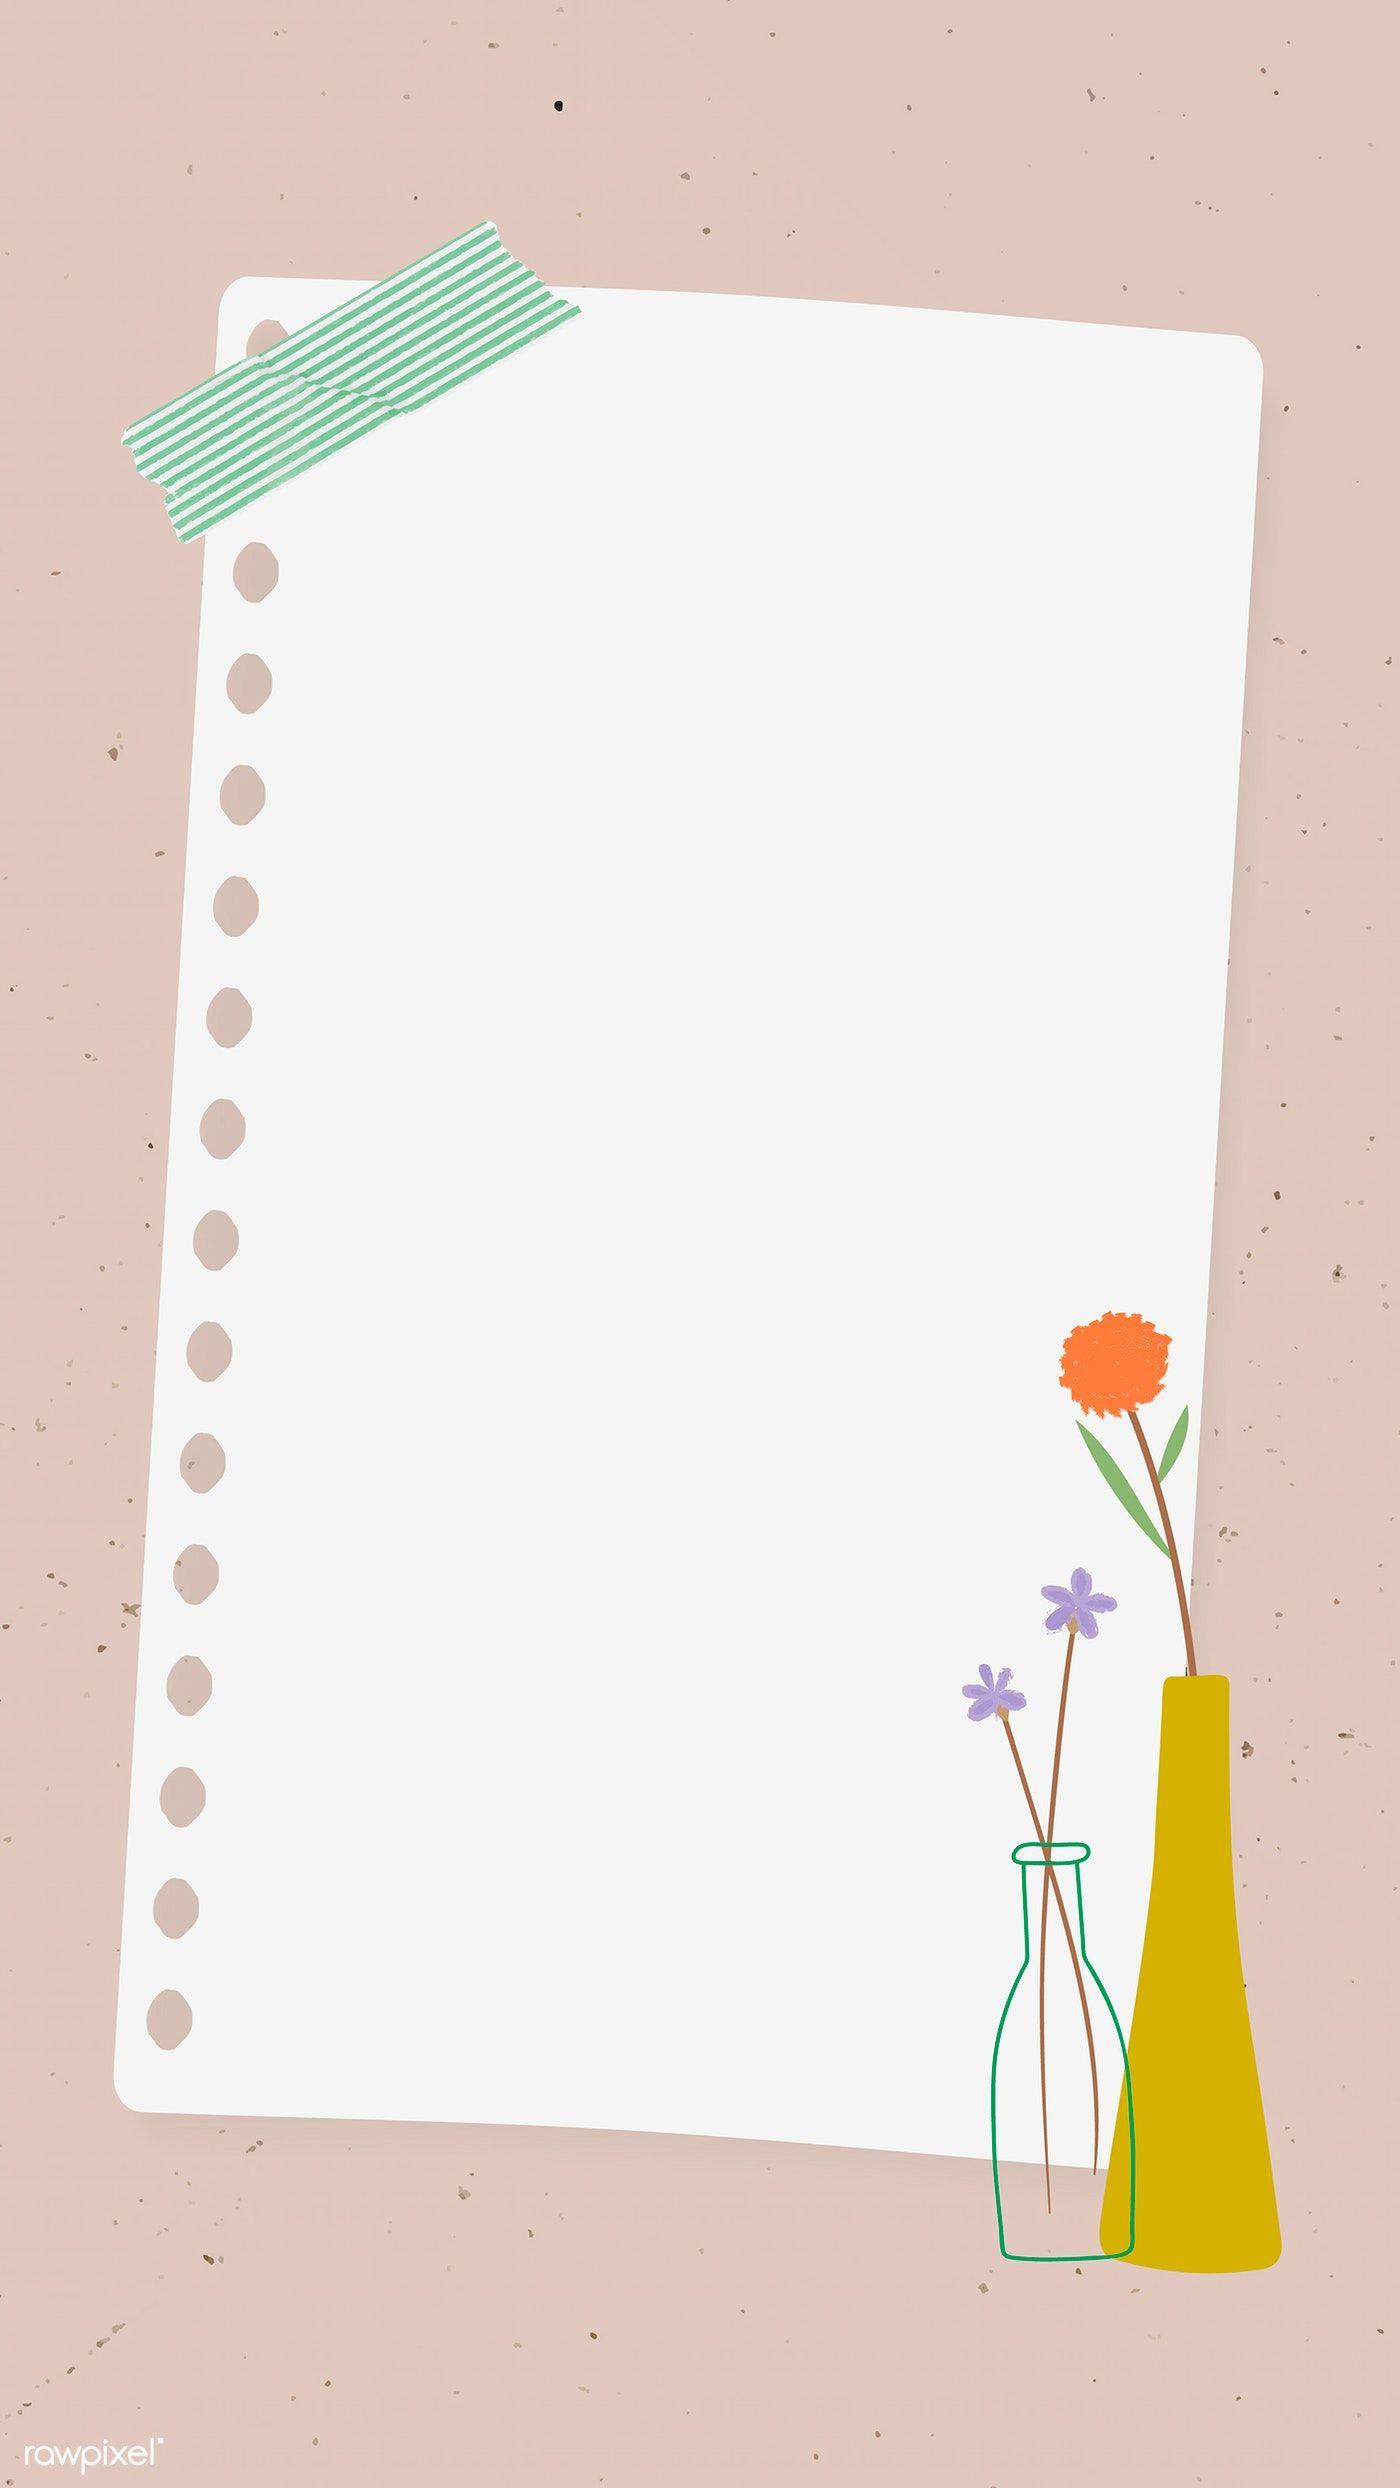 Download Premium Vector Of Doodle Flowers In Vases Note Paper On Pink Flower Doodles Note Paper Flower Background Wallpaper